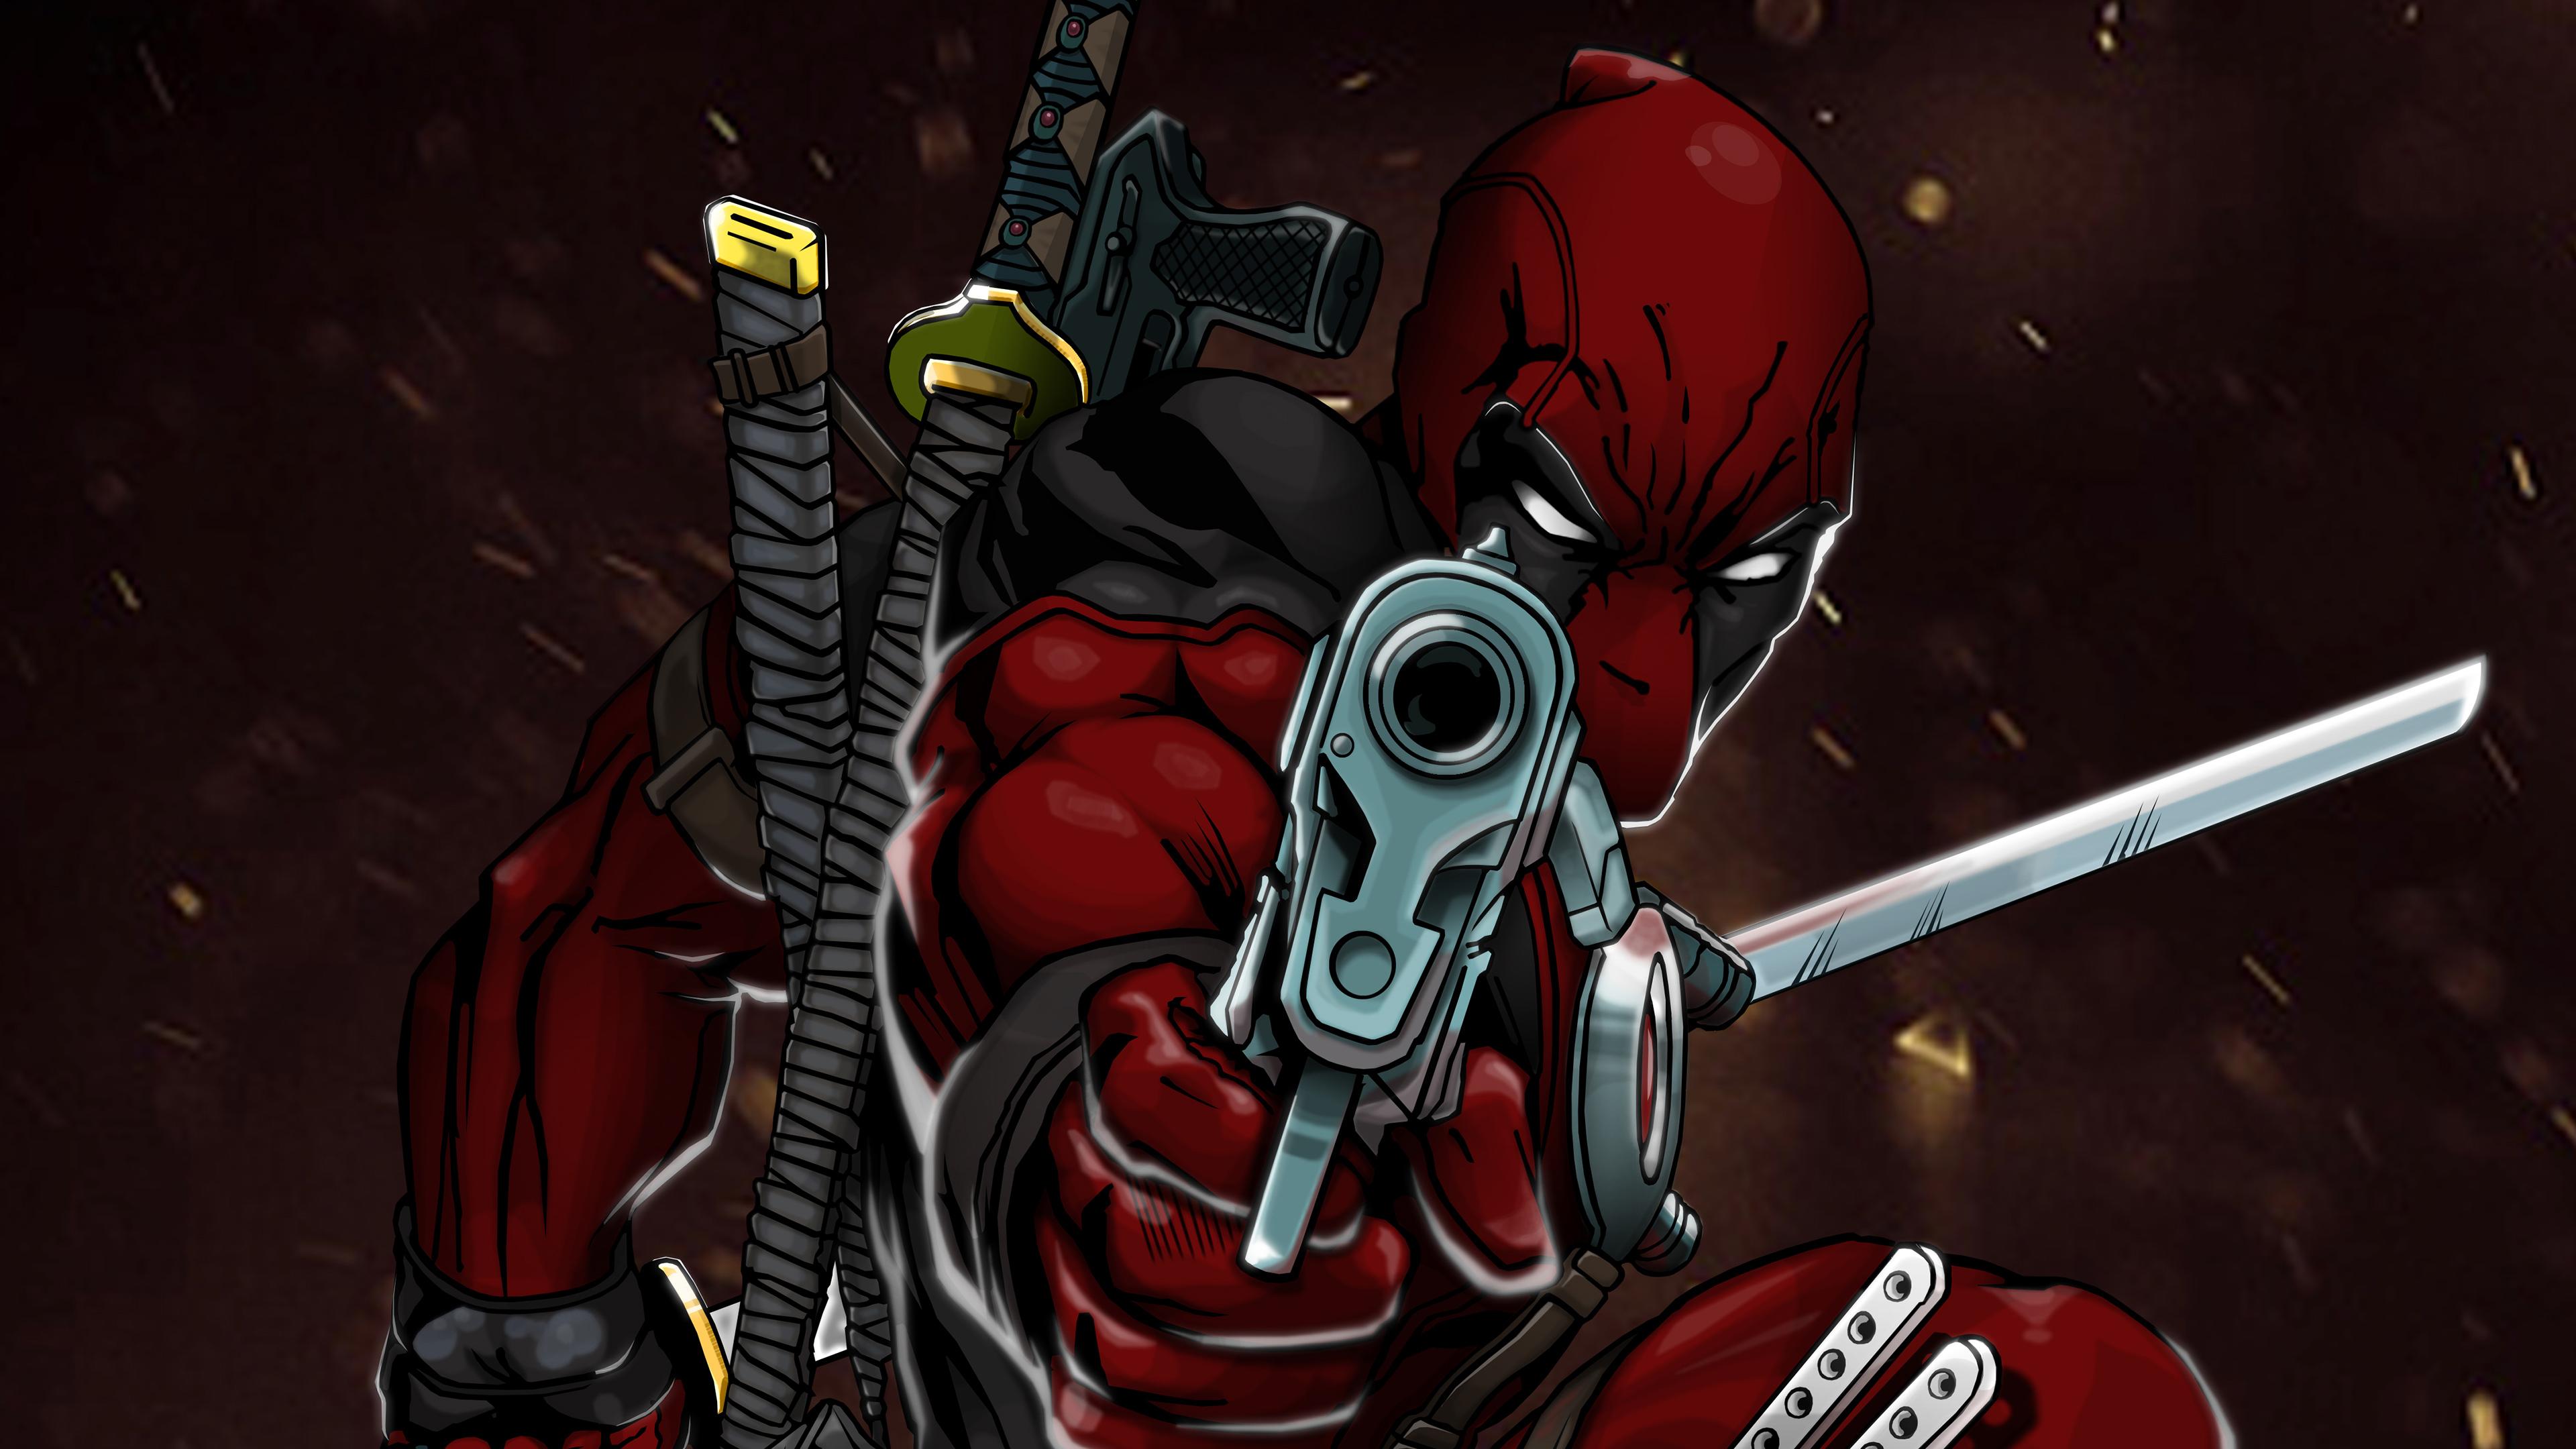 deadpool 4k art 1543620267 - Deadpool 4k Art - superheroes wallpapers, hd-wallpapers, digital art wallpapers, deadpool wallpapers, behance wallpapers, artwork wallpapers, art wallpapers, 4k-wallpapers